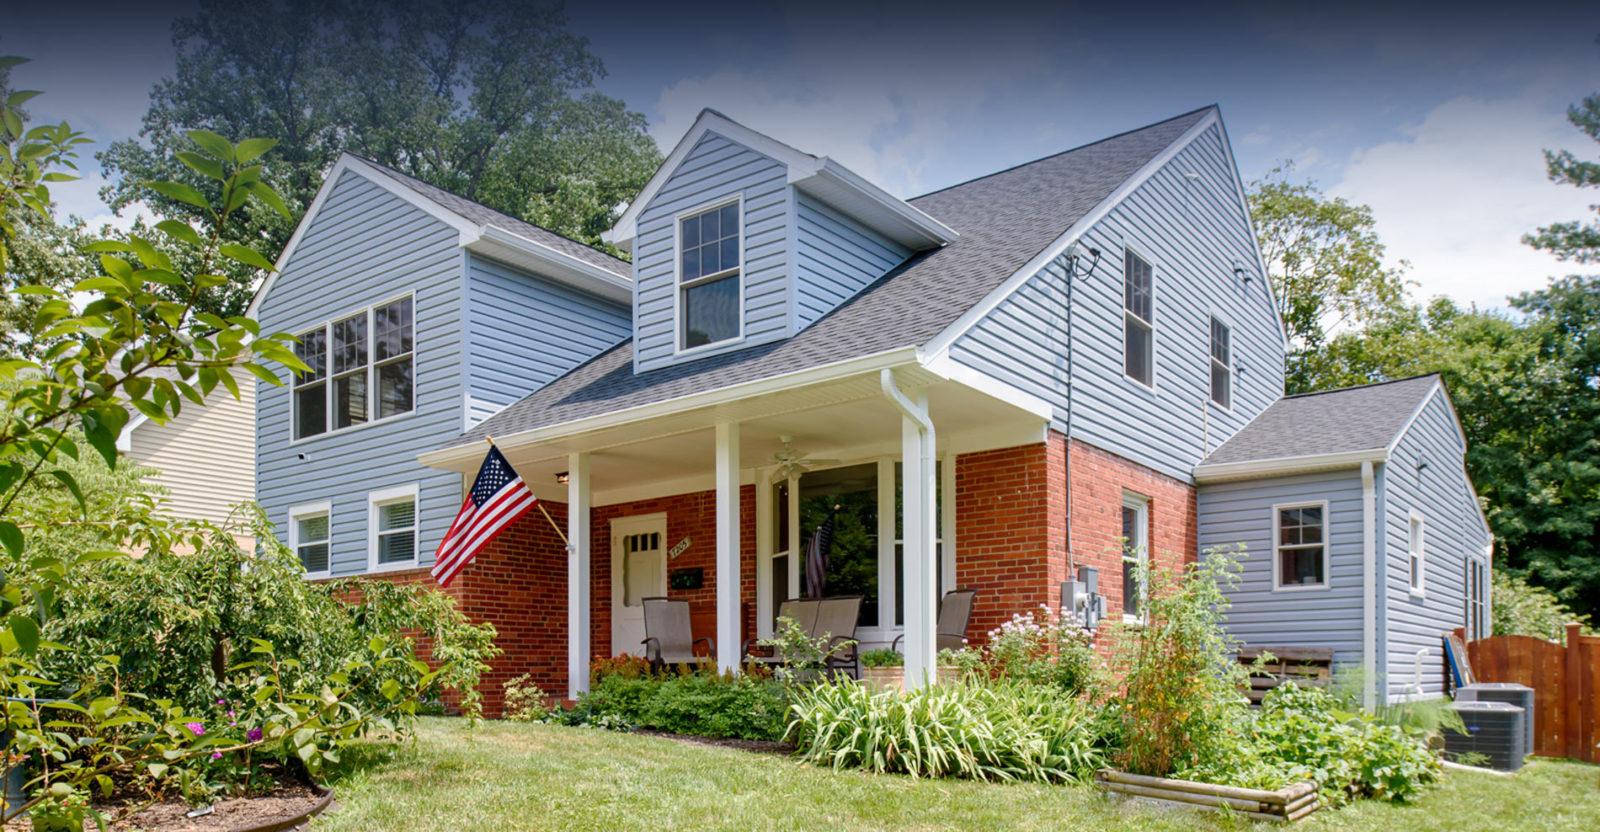 Fairfax VA home addition